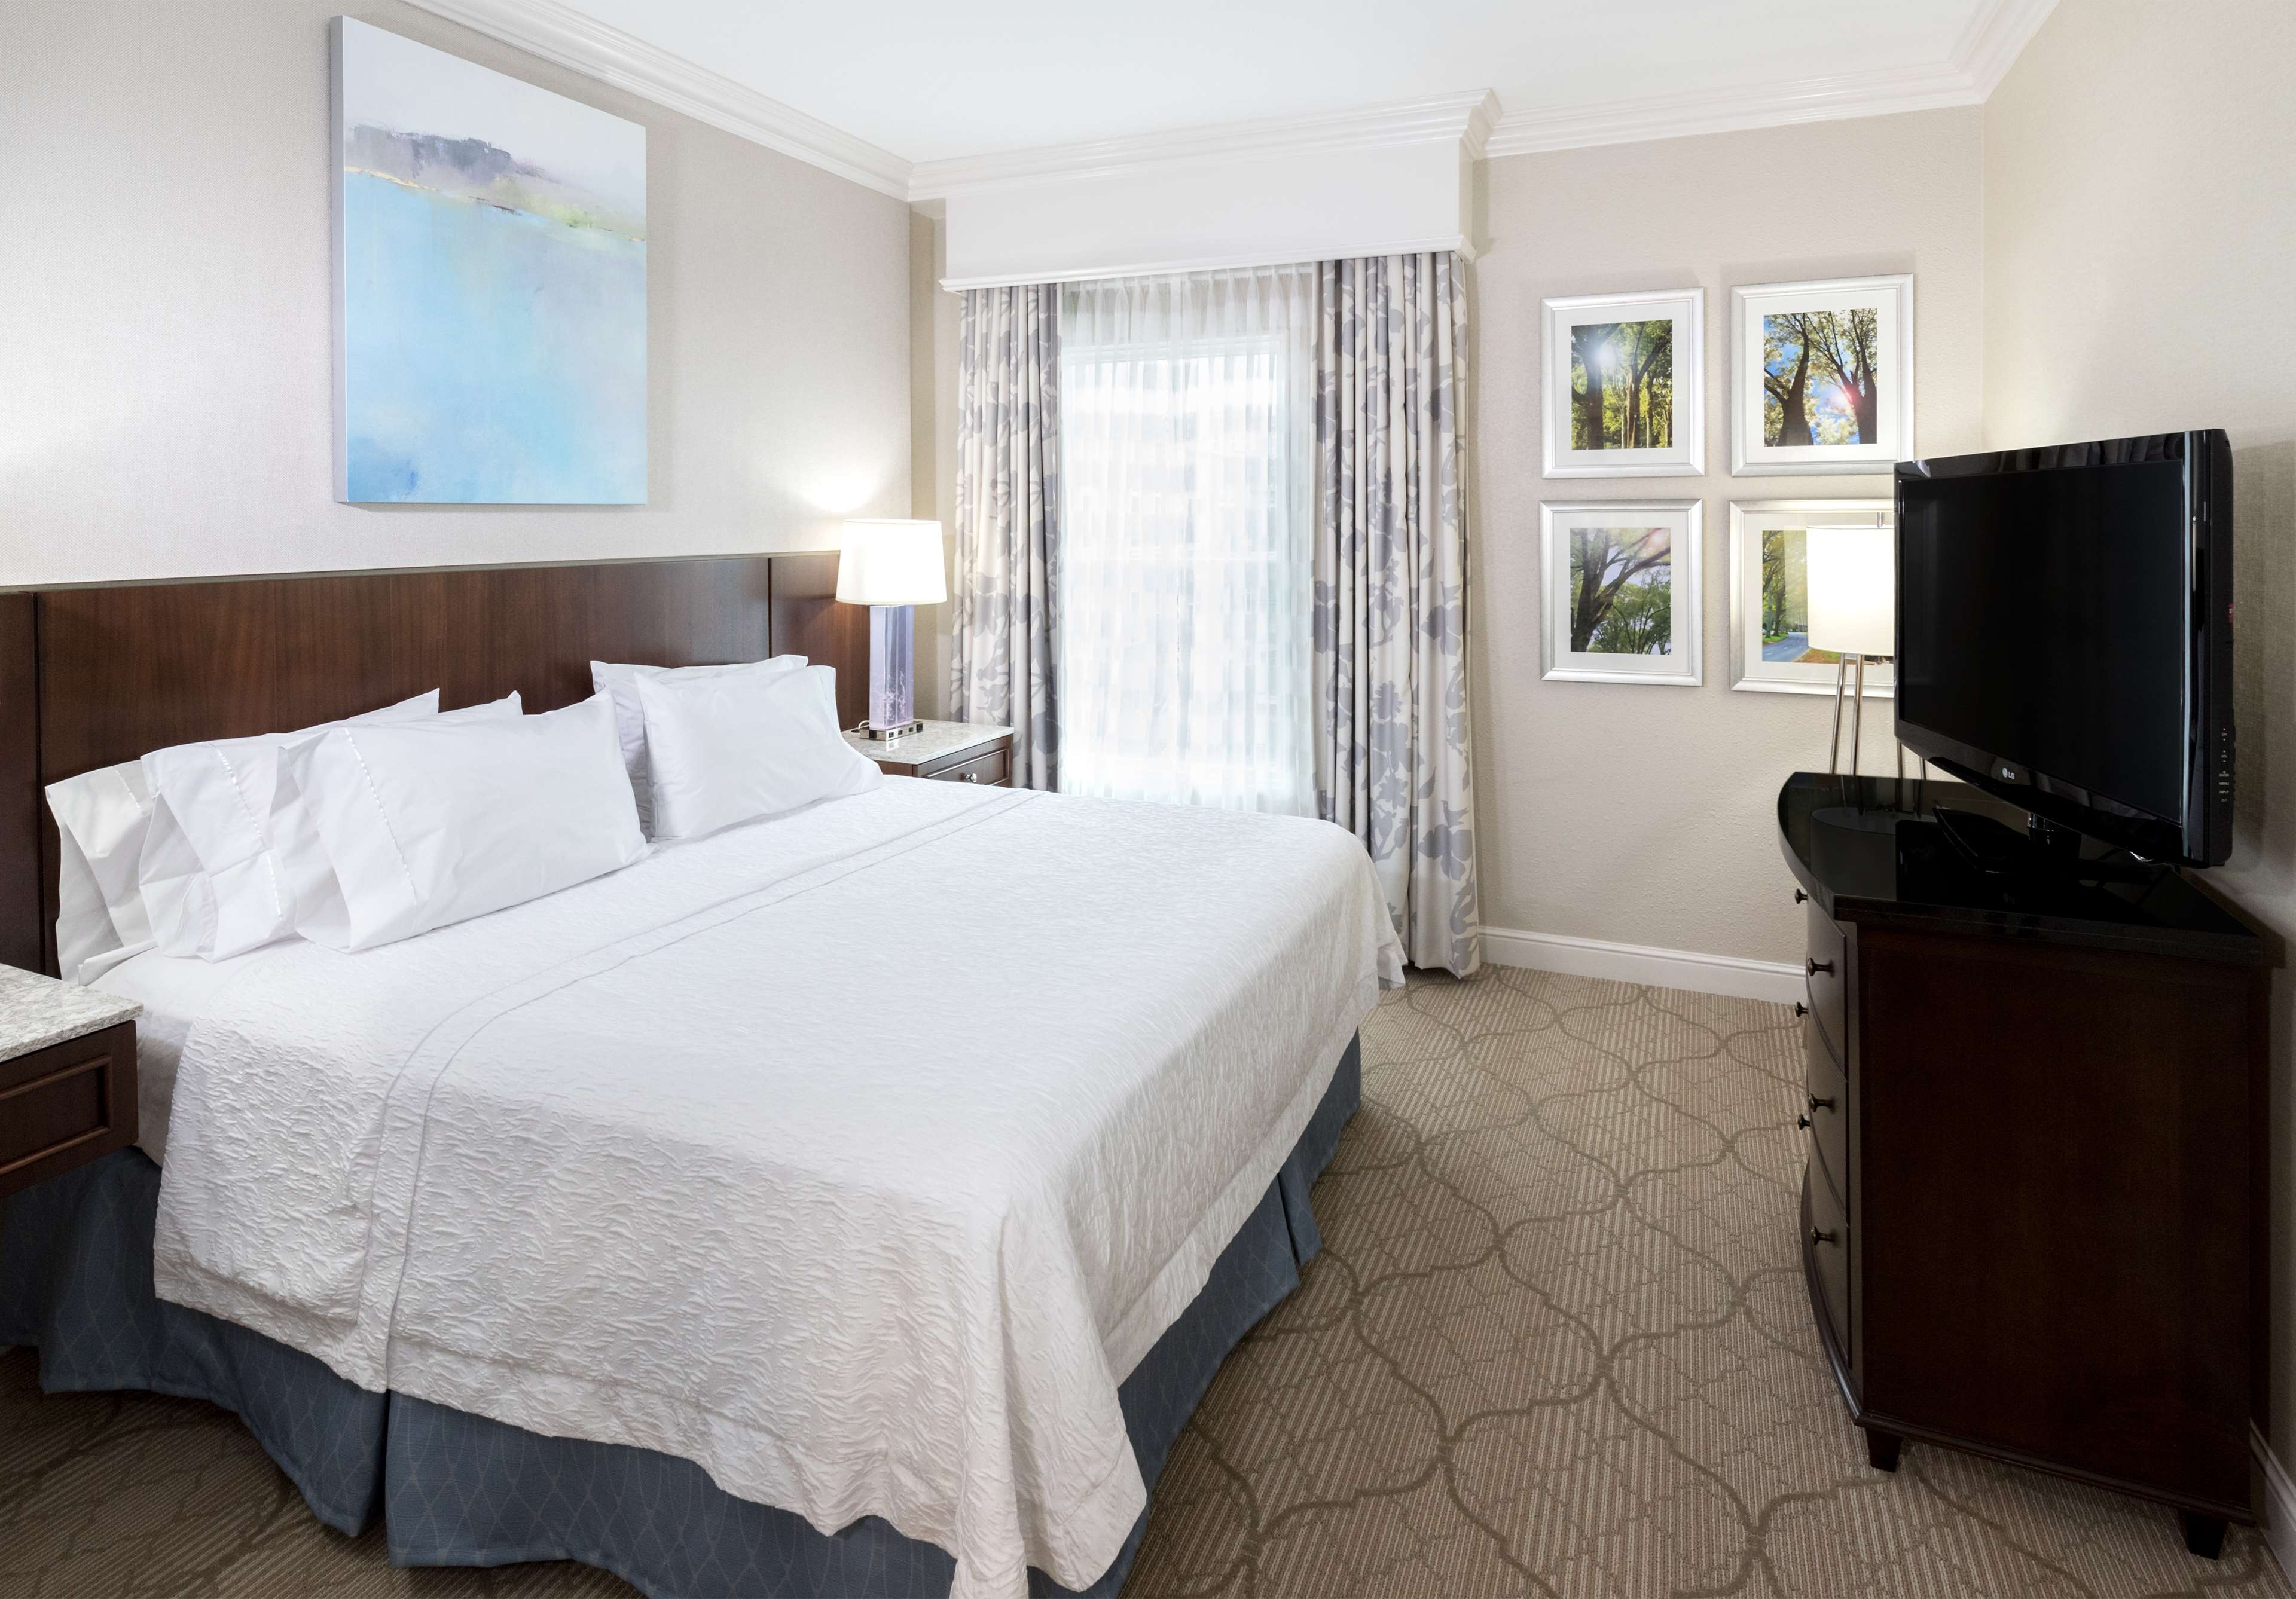 Hampton Inn & Suites Charlotte/South Park at Phillips Place image 31